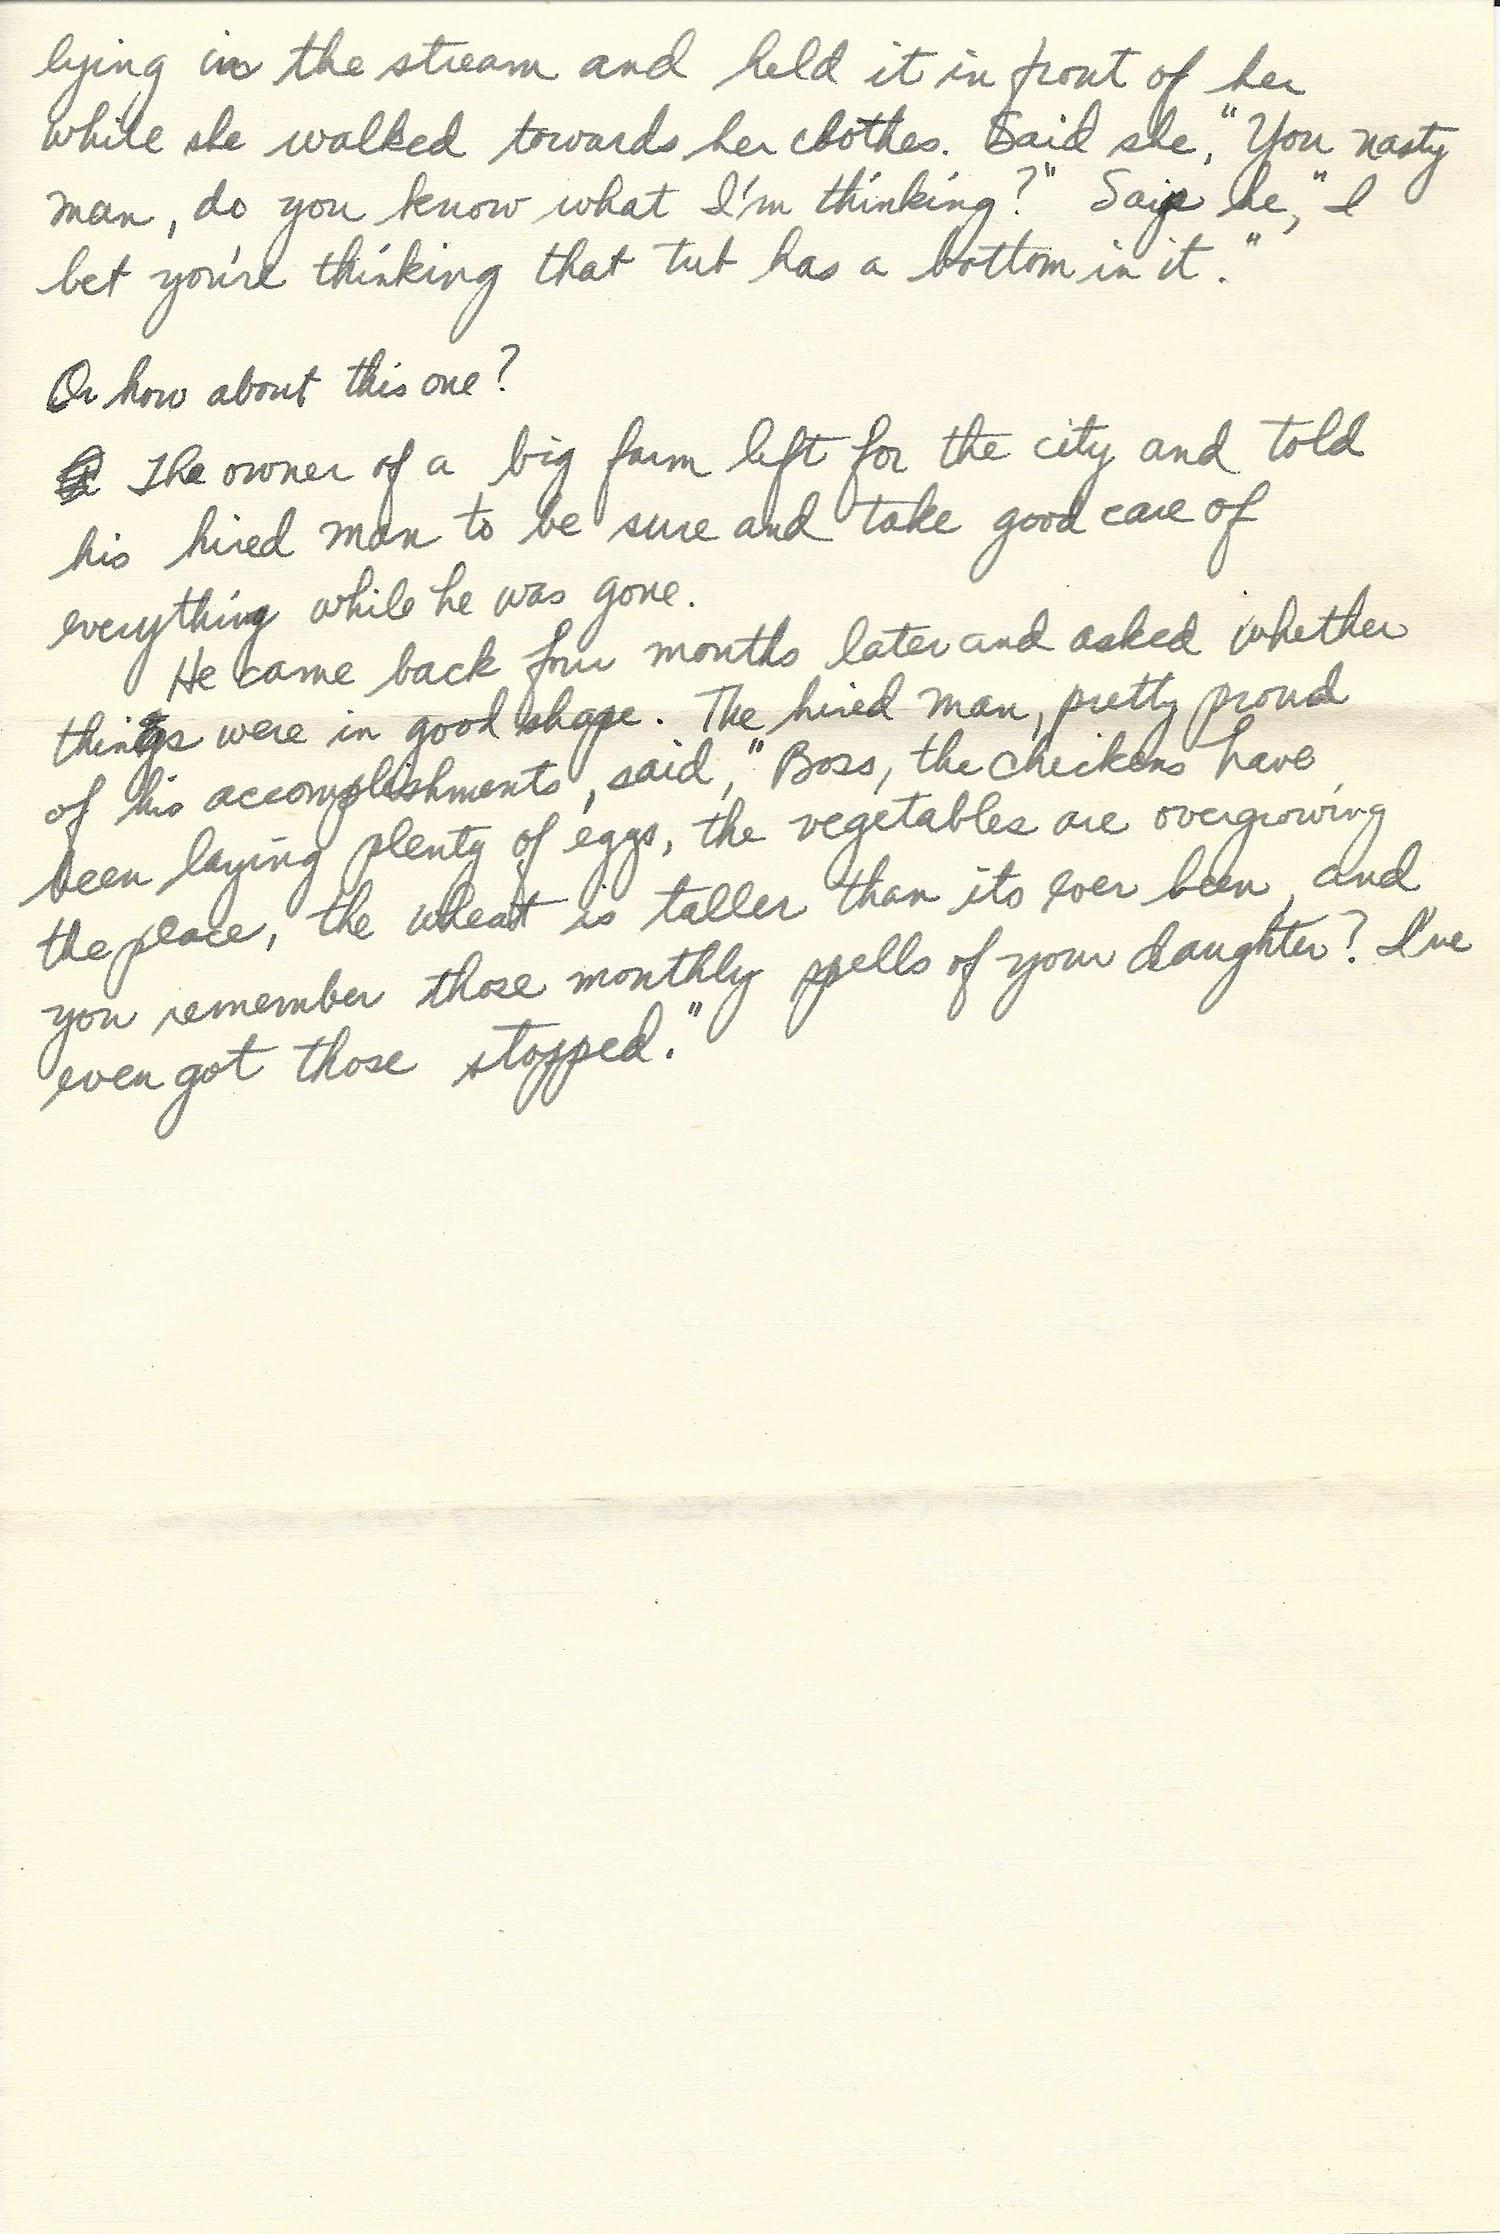 Mar. 11, 1953 (Bob) Page 4